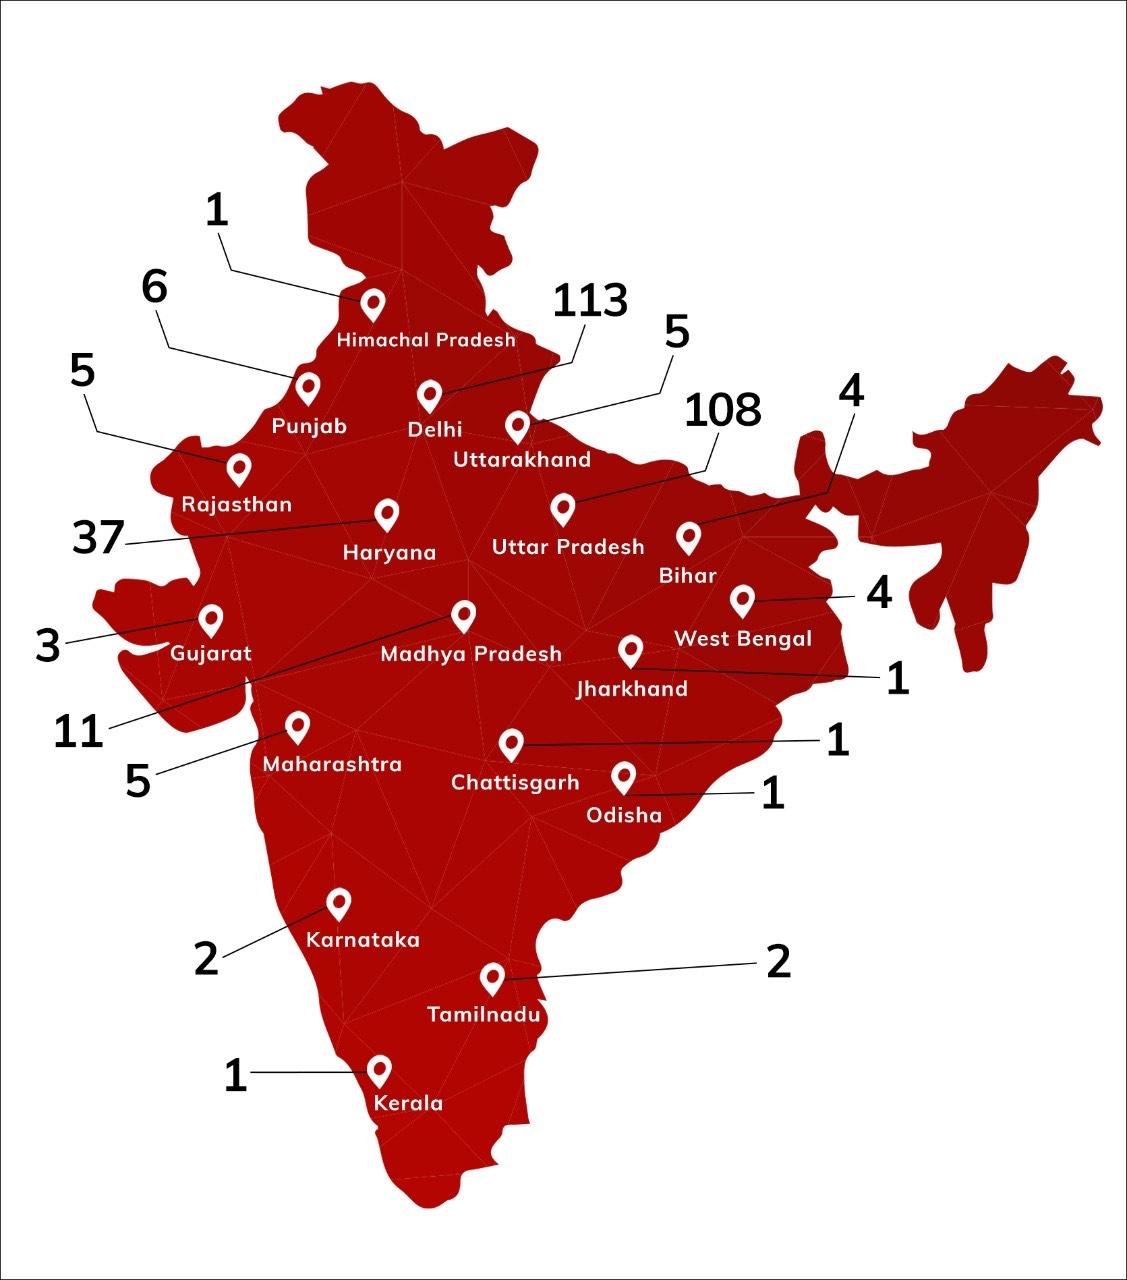 Symbiosis NOIDA - Top BBA Colleges in Delhi NCR